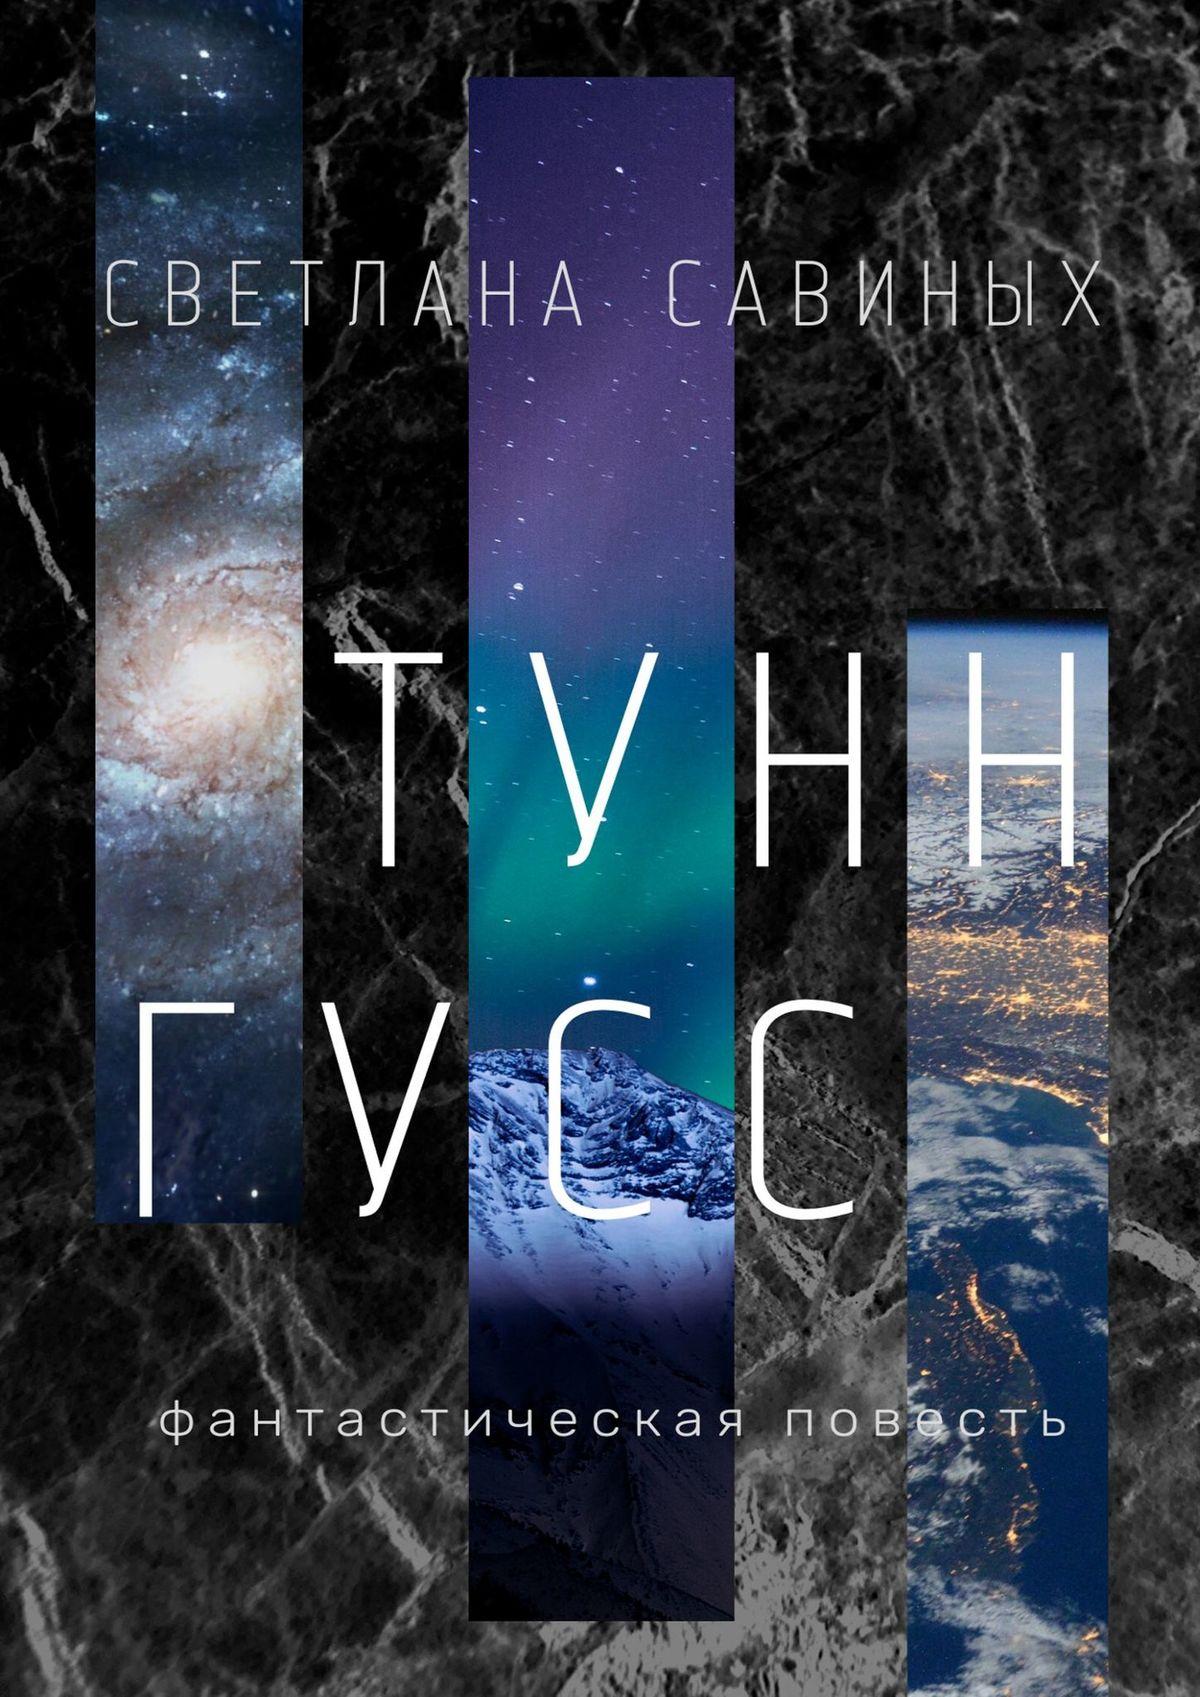 Светлана Савиных Тунн-Гусс